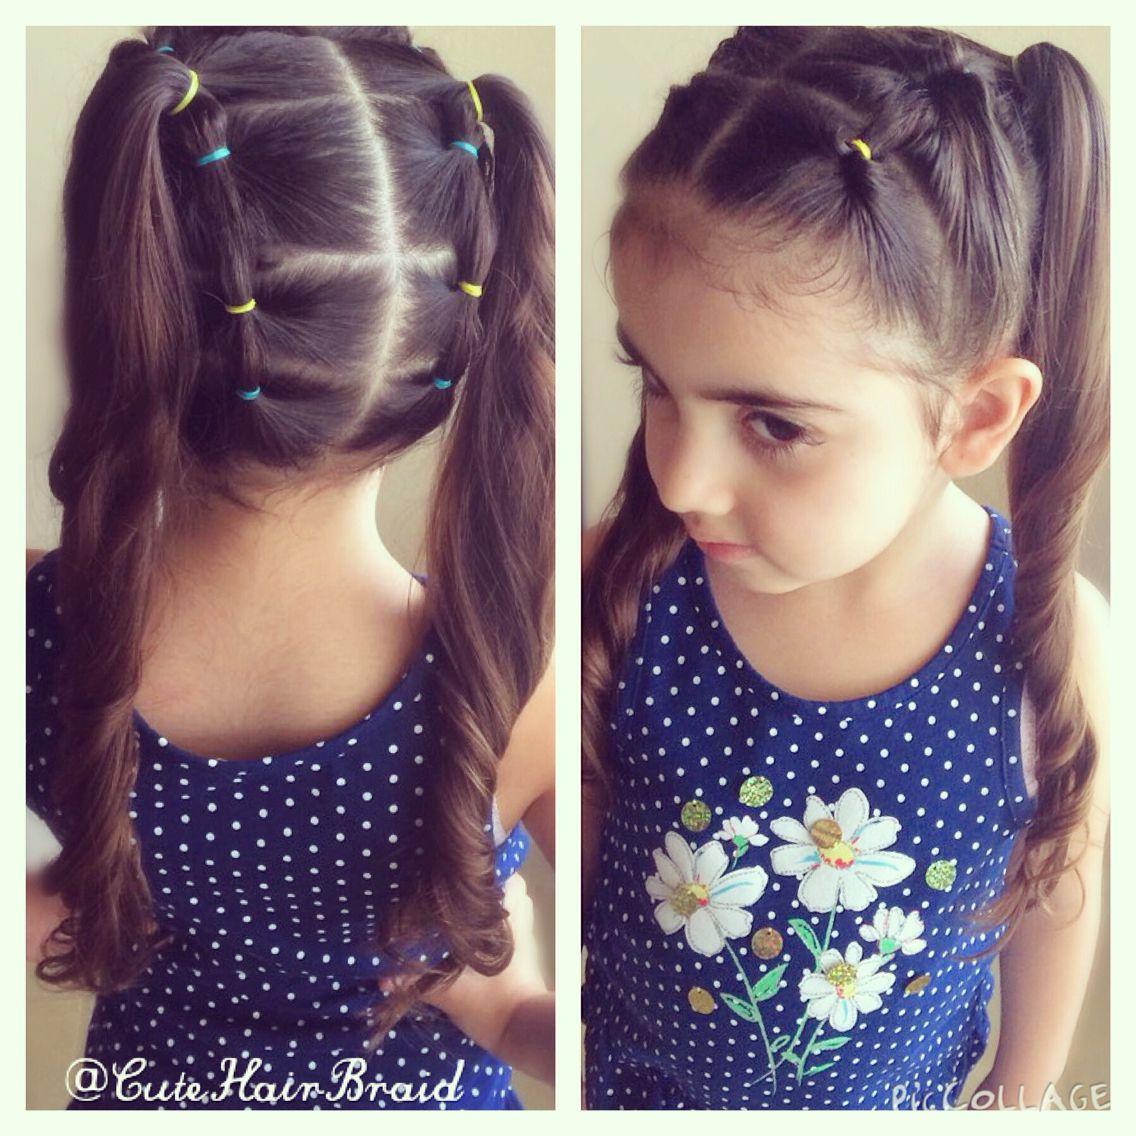 Ponytails hairstyle for girls peinados para niñas hairstyles